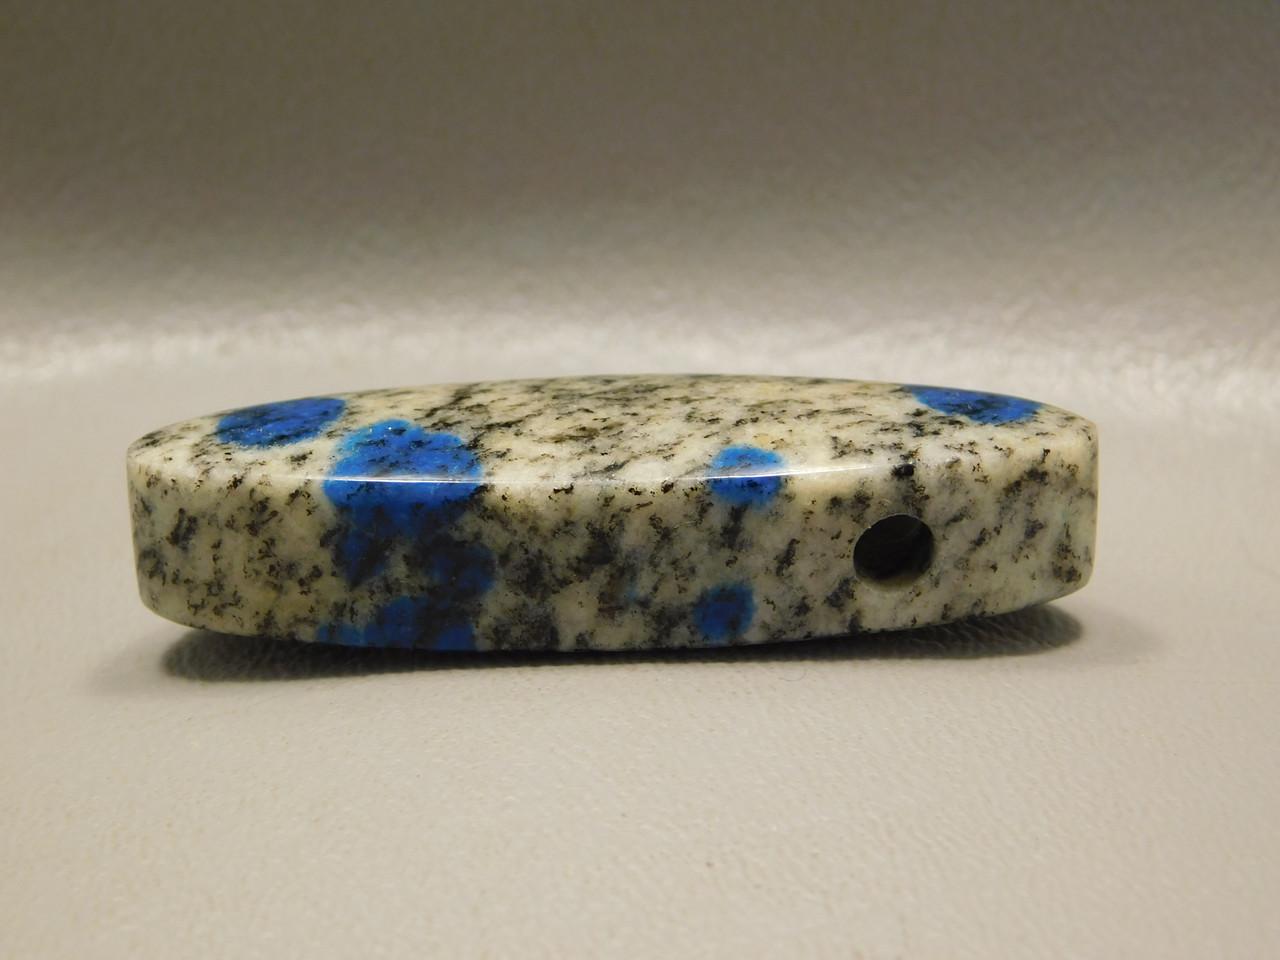 K2 Azurite Granite Stone Bead Pendant #1